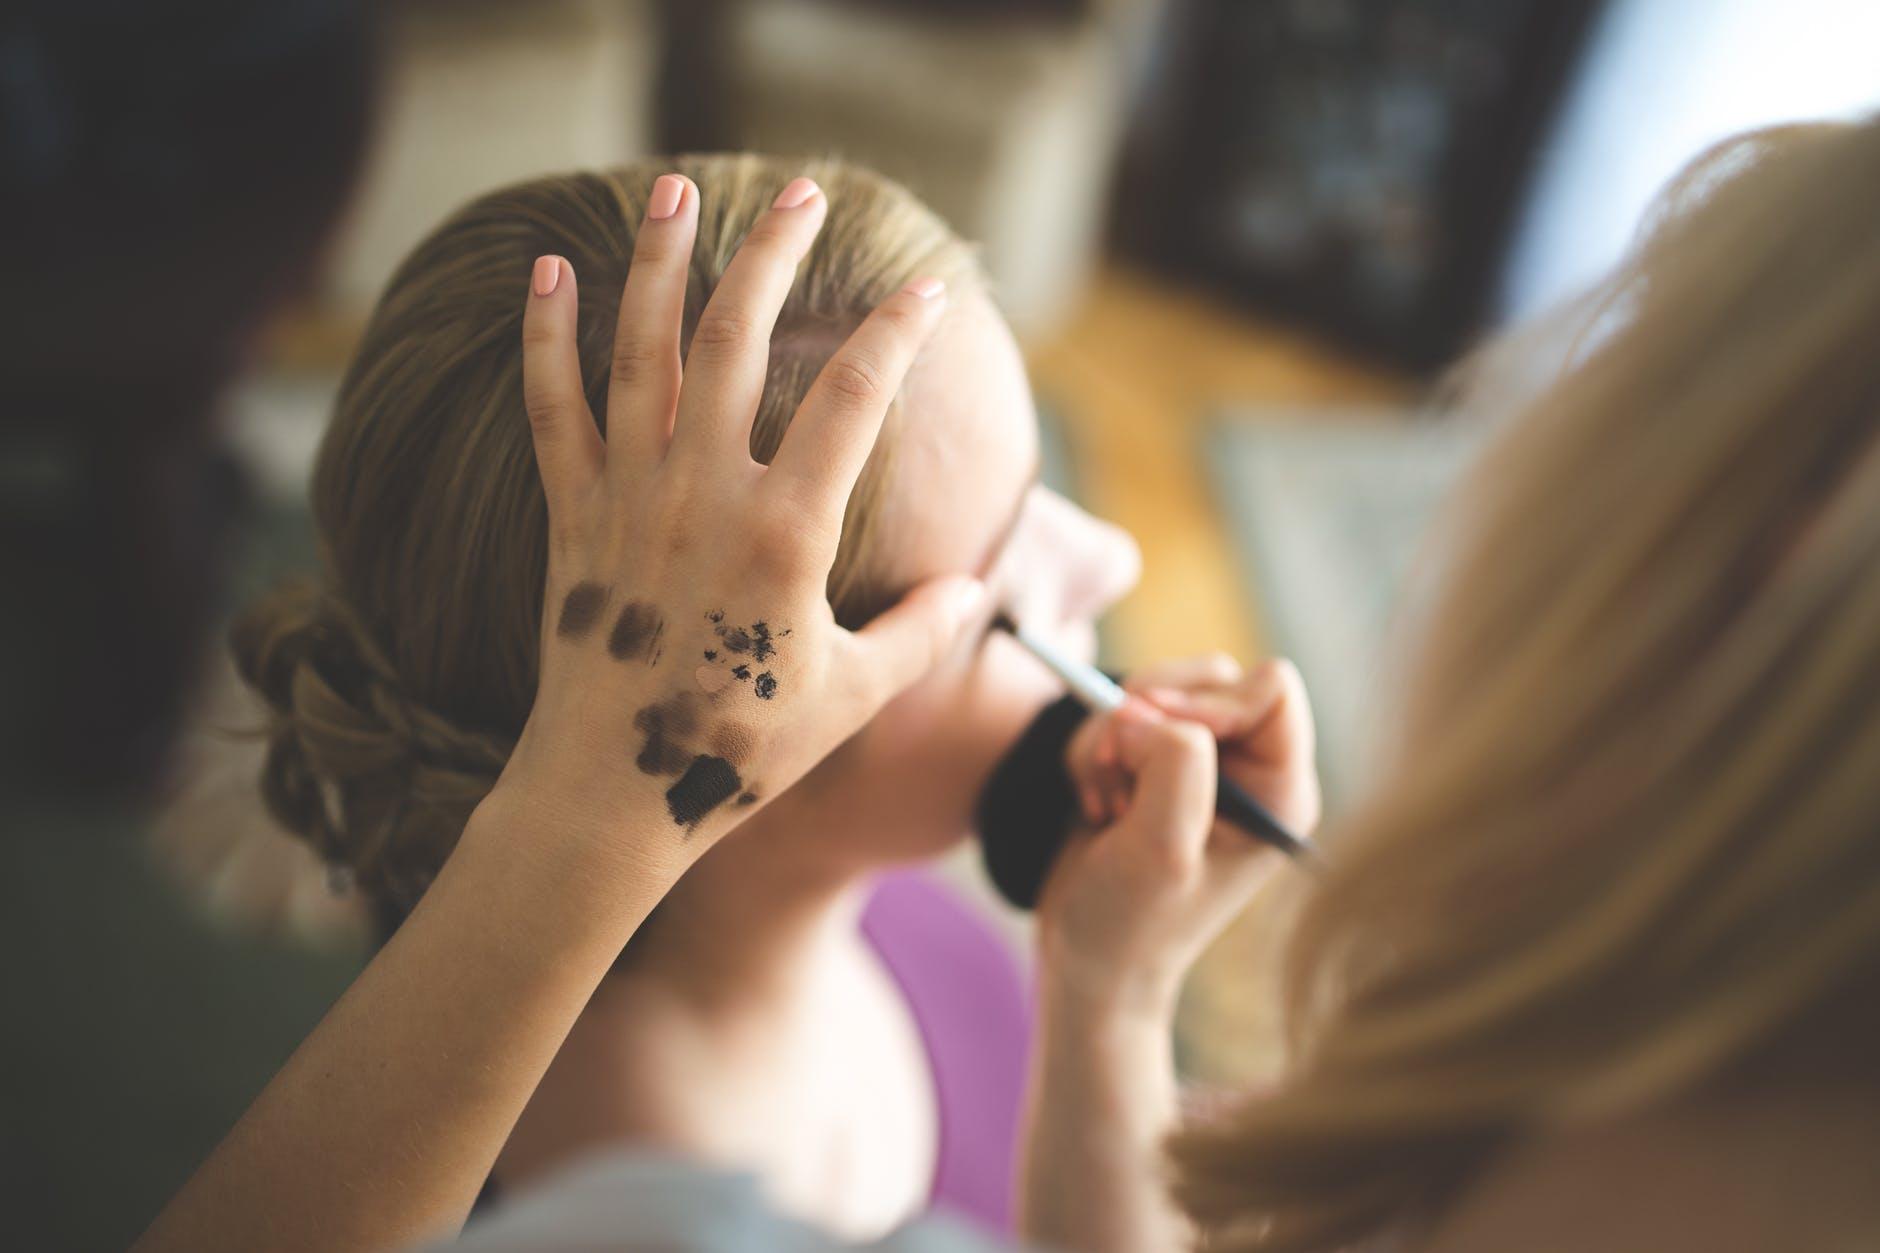 woman-hand-girl-professional.jpg